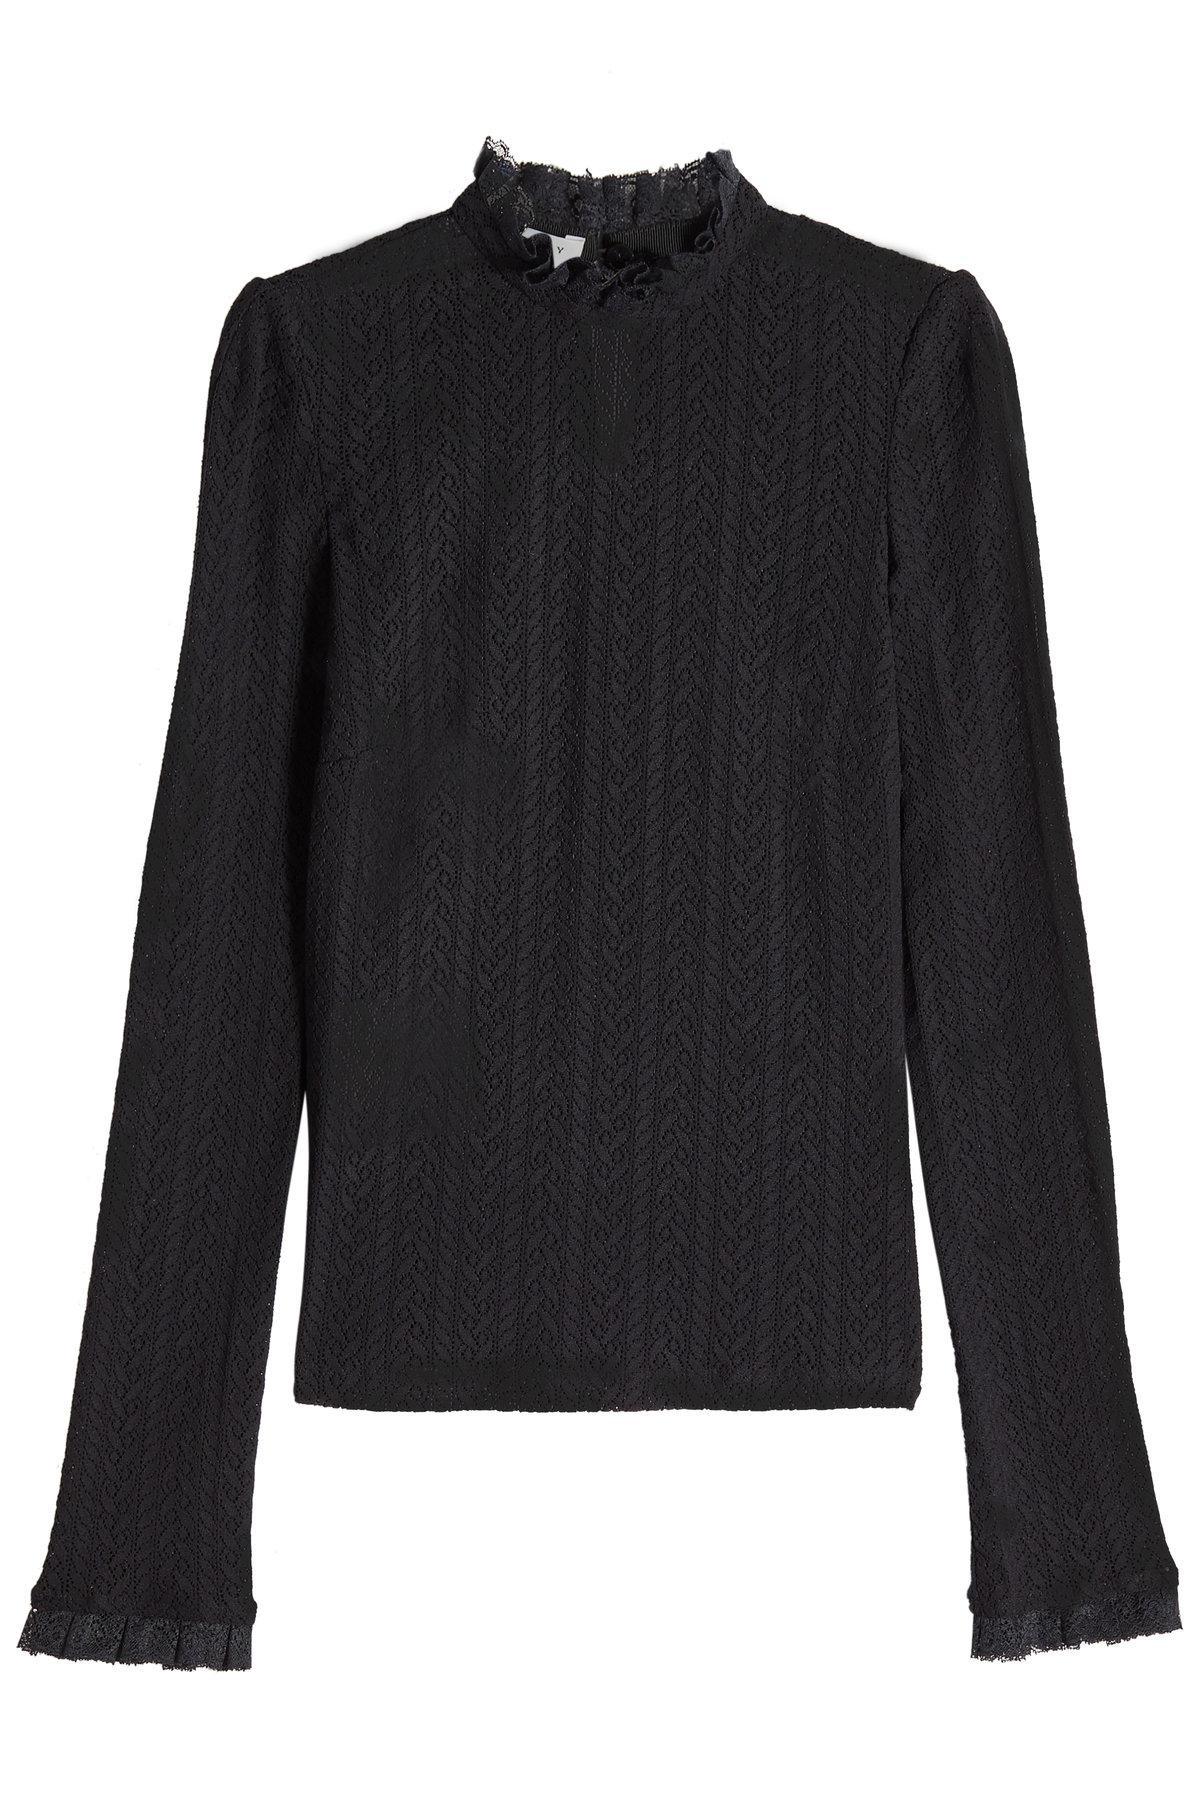 floral ruched neck blouse - Black Philosophy di Lorenzo Serafini Discount 2018 New Nicekicks Cheap Online q5eXeT3Yb7